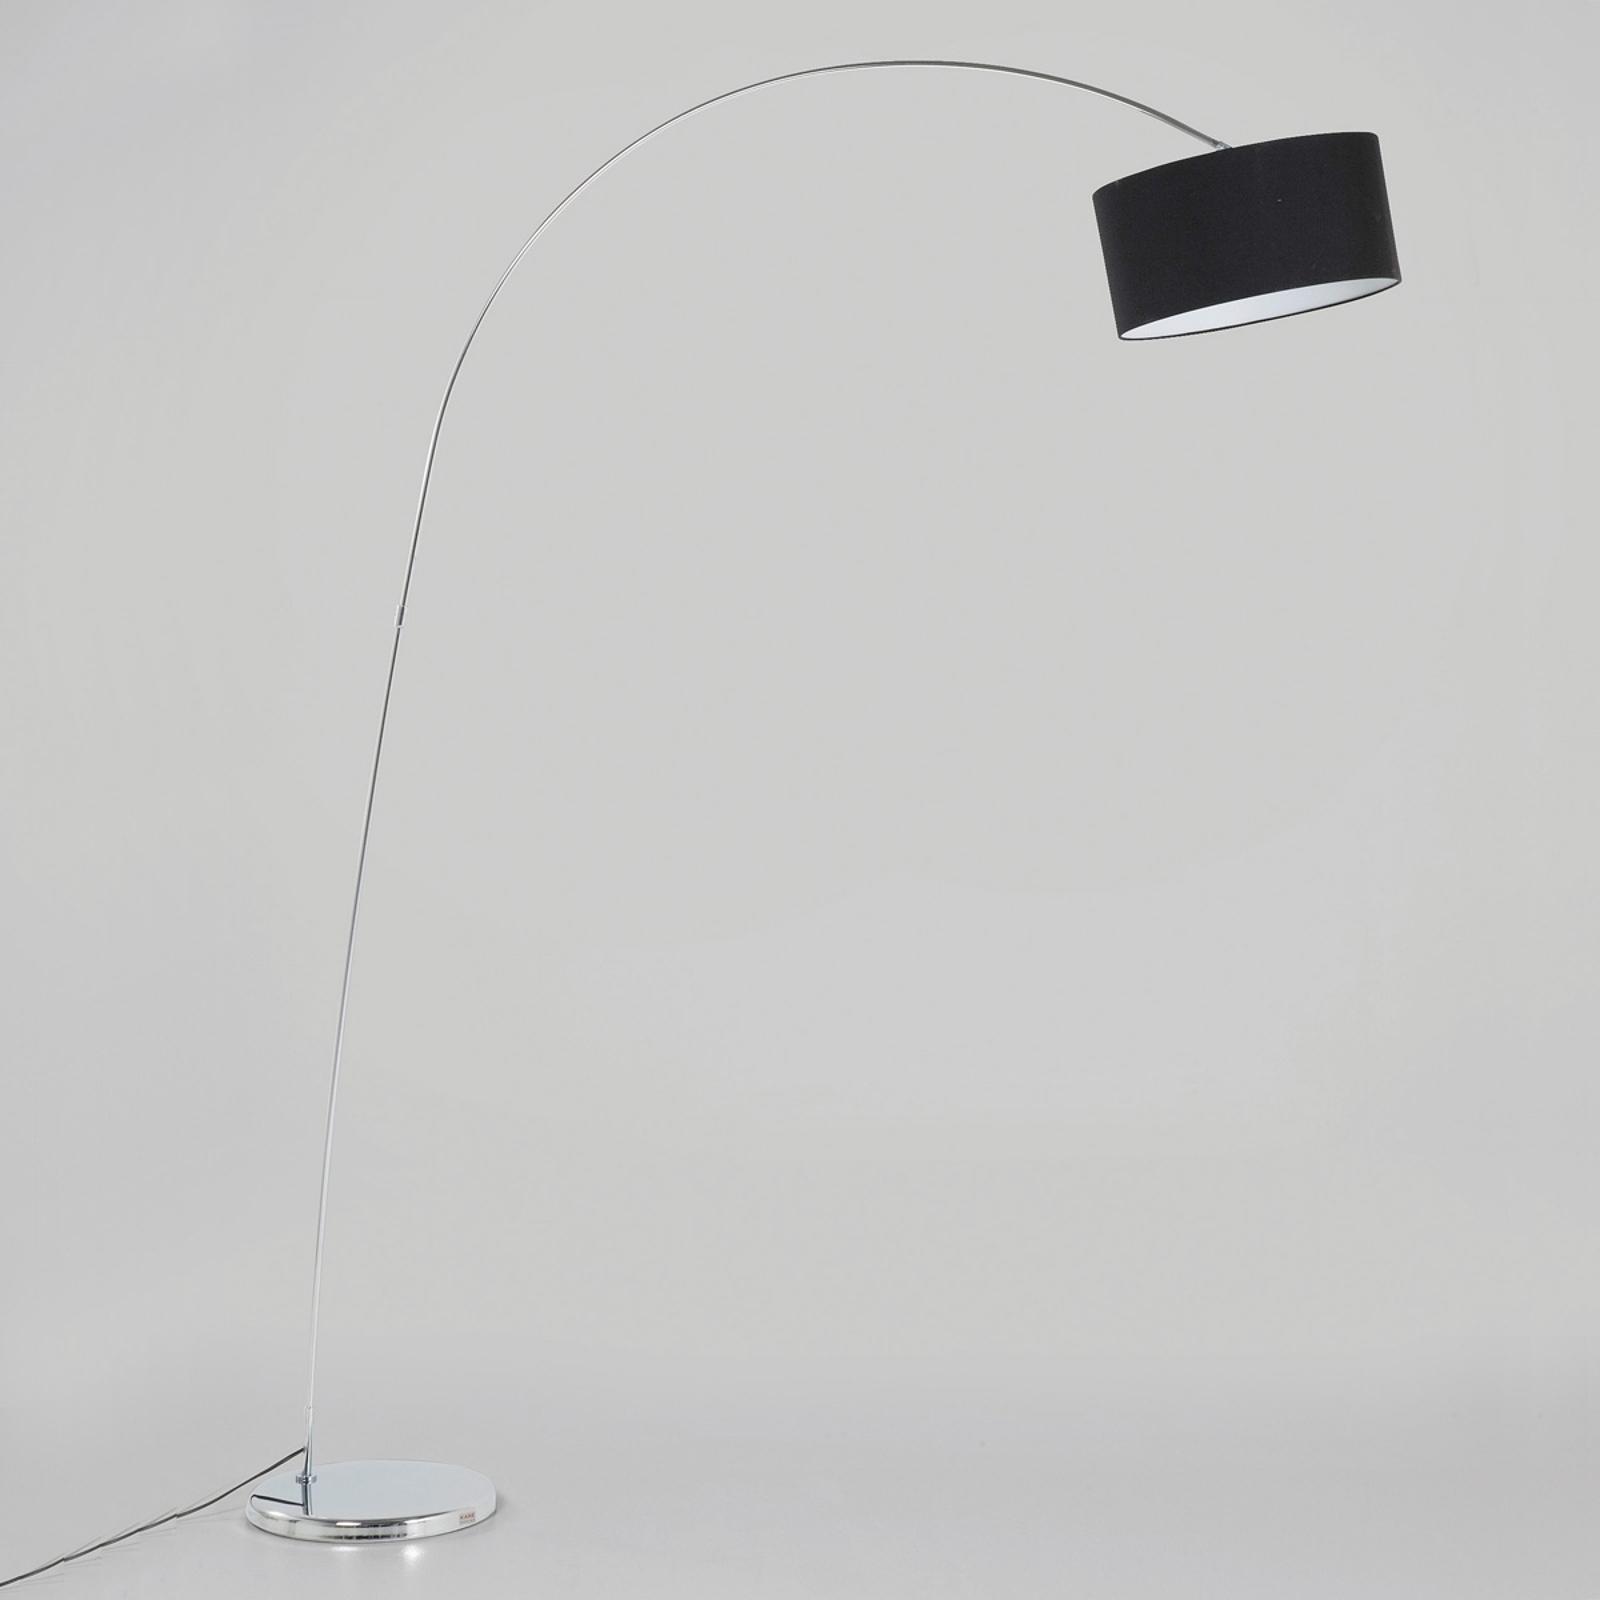 Kare Gooseneck boogvloerlamp met zwart kap